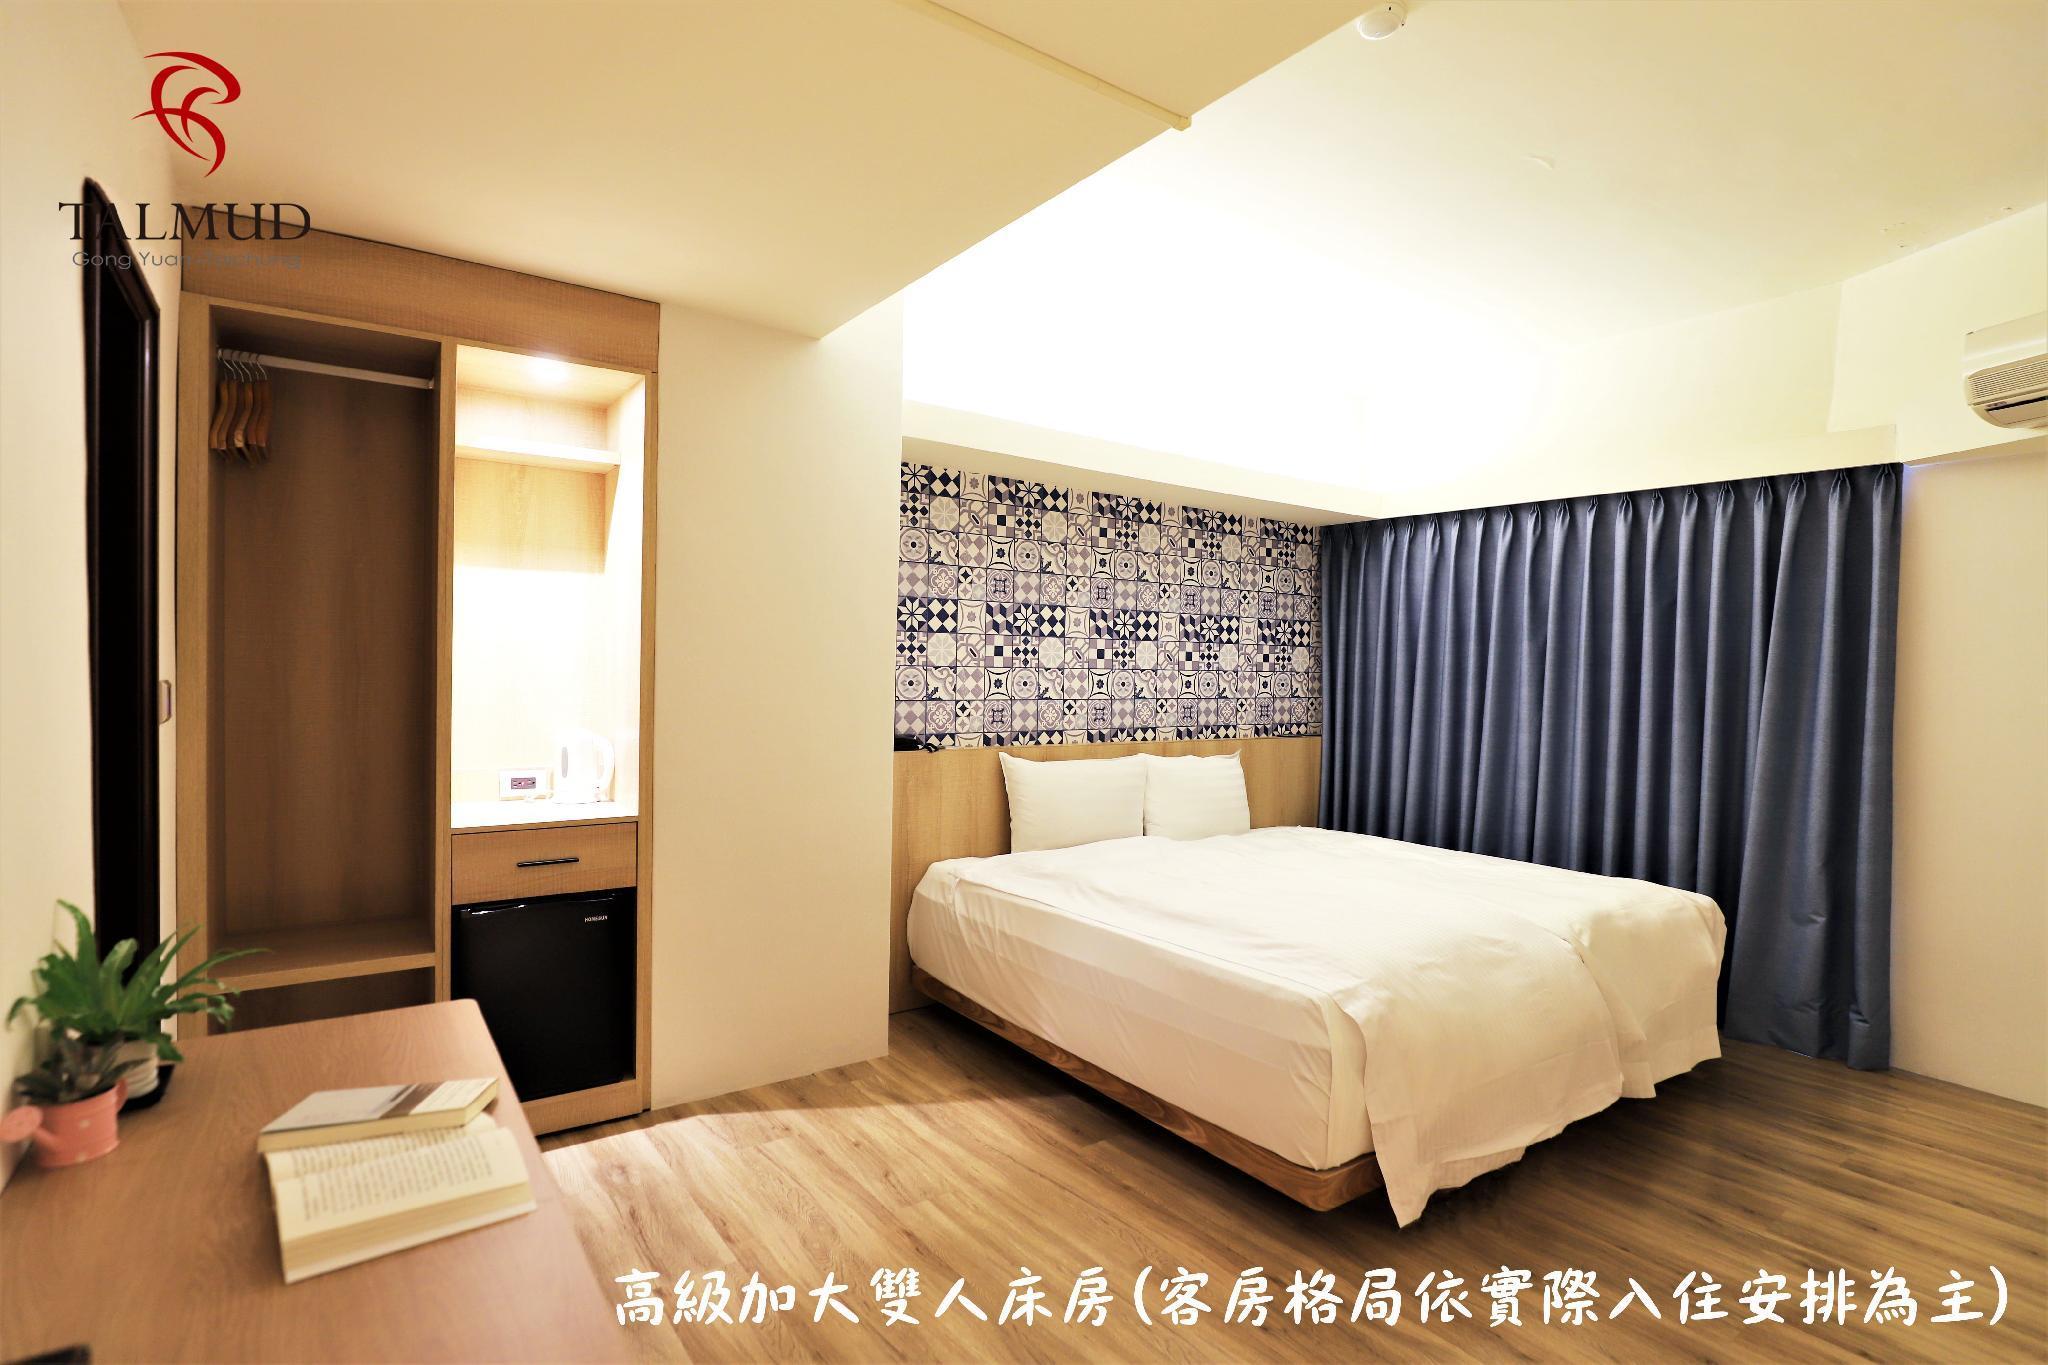 Talmud Business Hotel � Gong Yuan